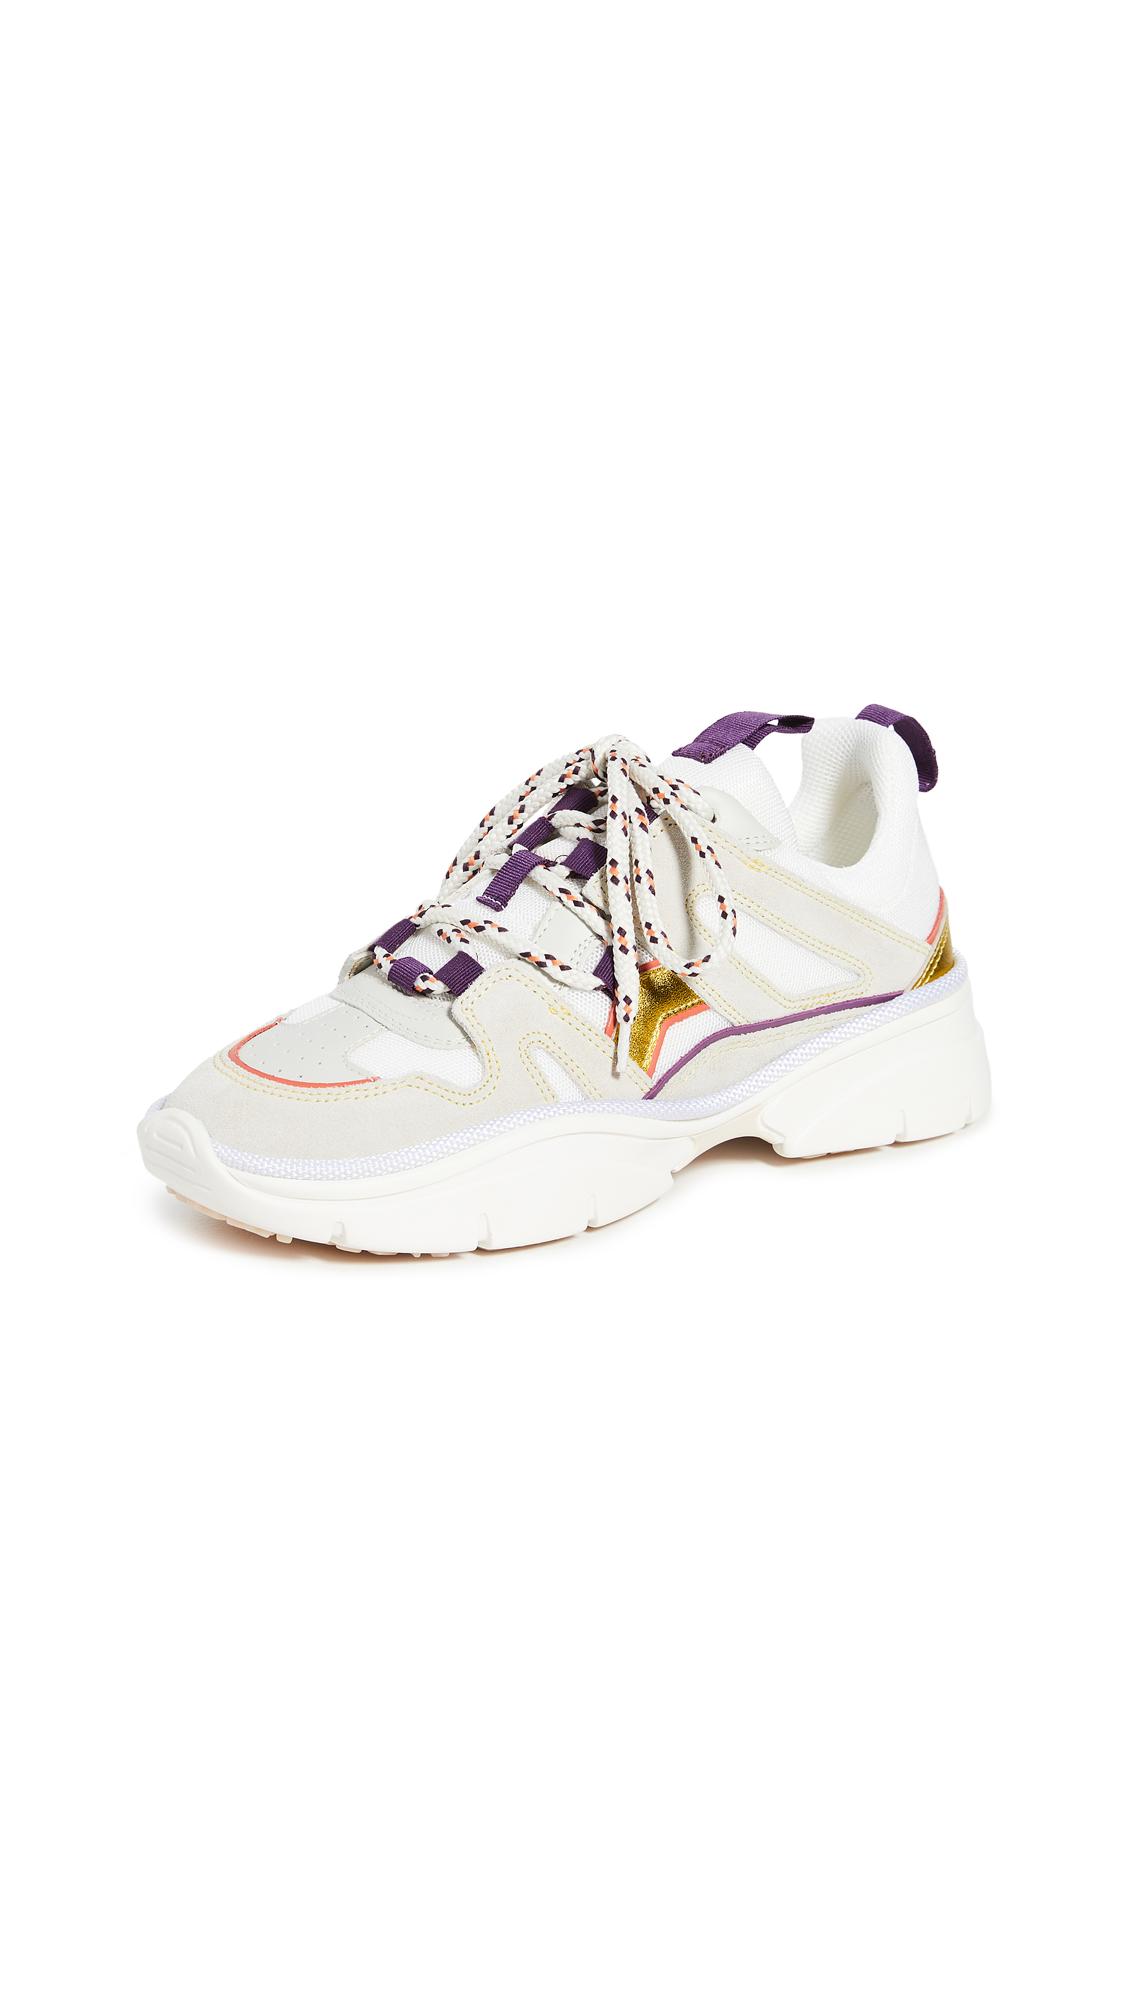 Isabel Marant Flashy Kindsay Running Sneakers - 40% Off Sale